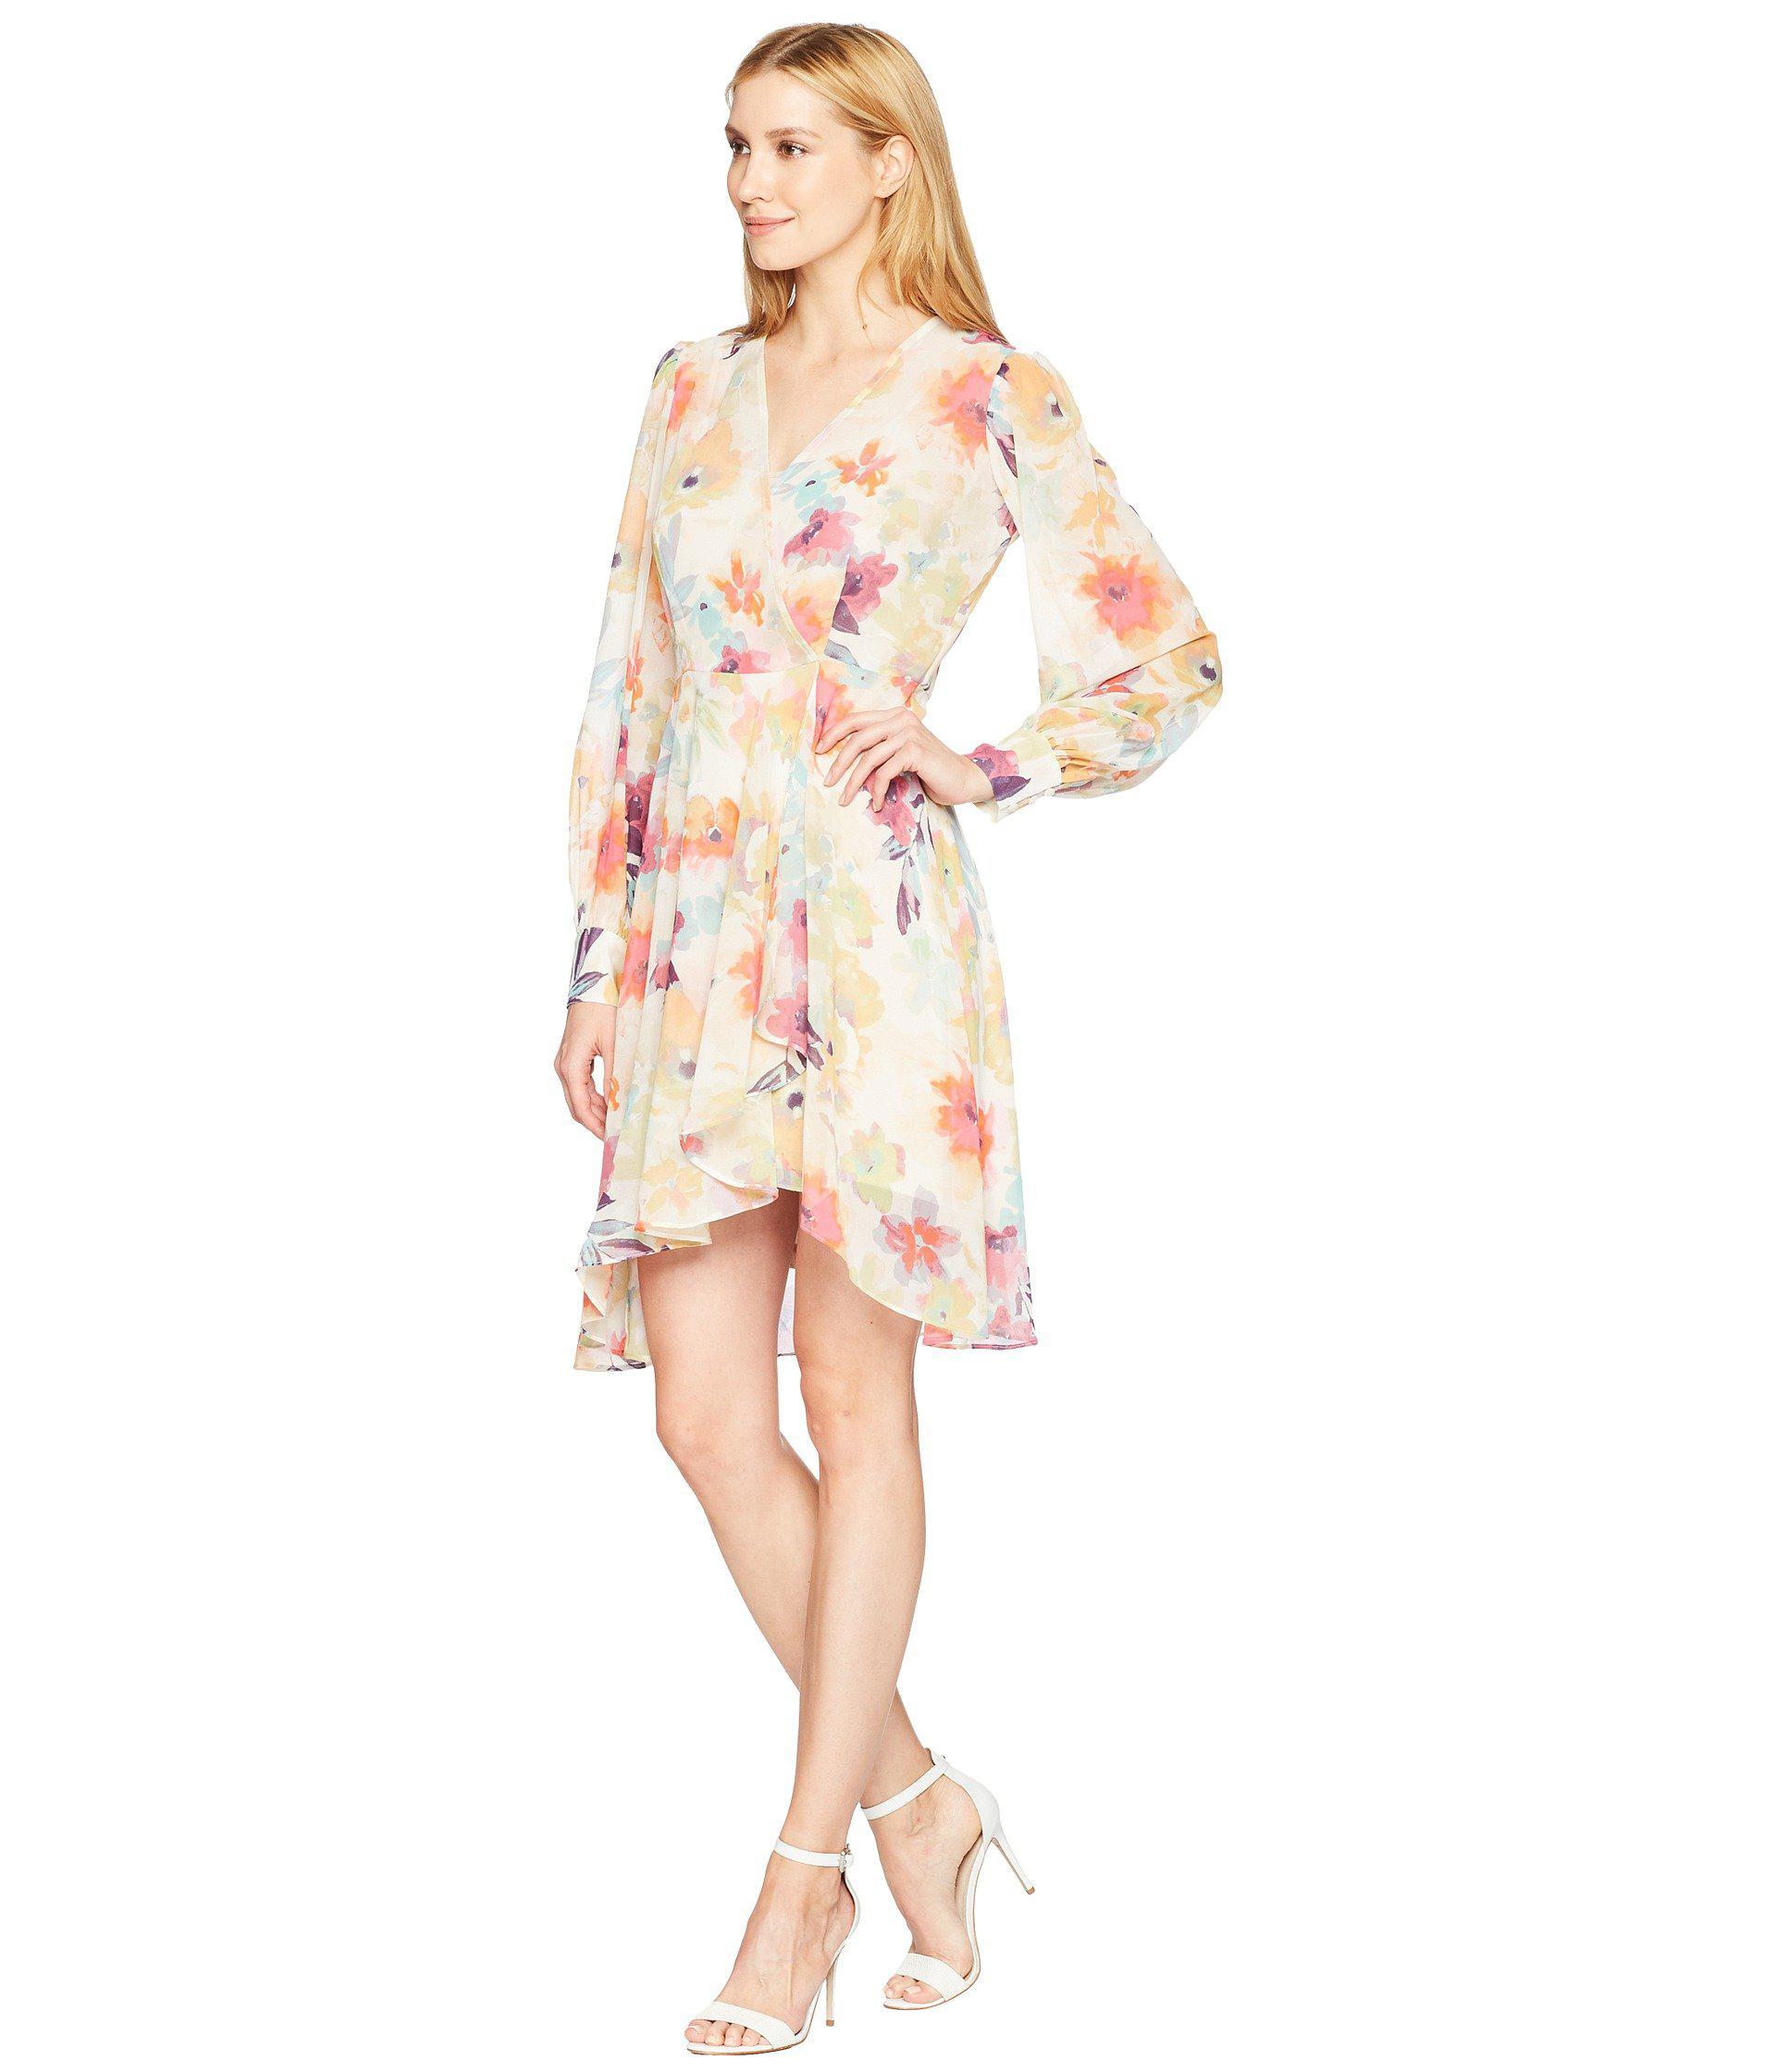 77b2c1c684f10 Lyst - Calvin Klein Long Sleeve V-neck Floral Print Chiffon Dress ...